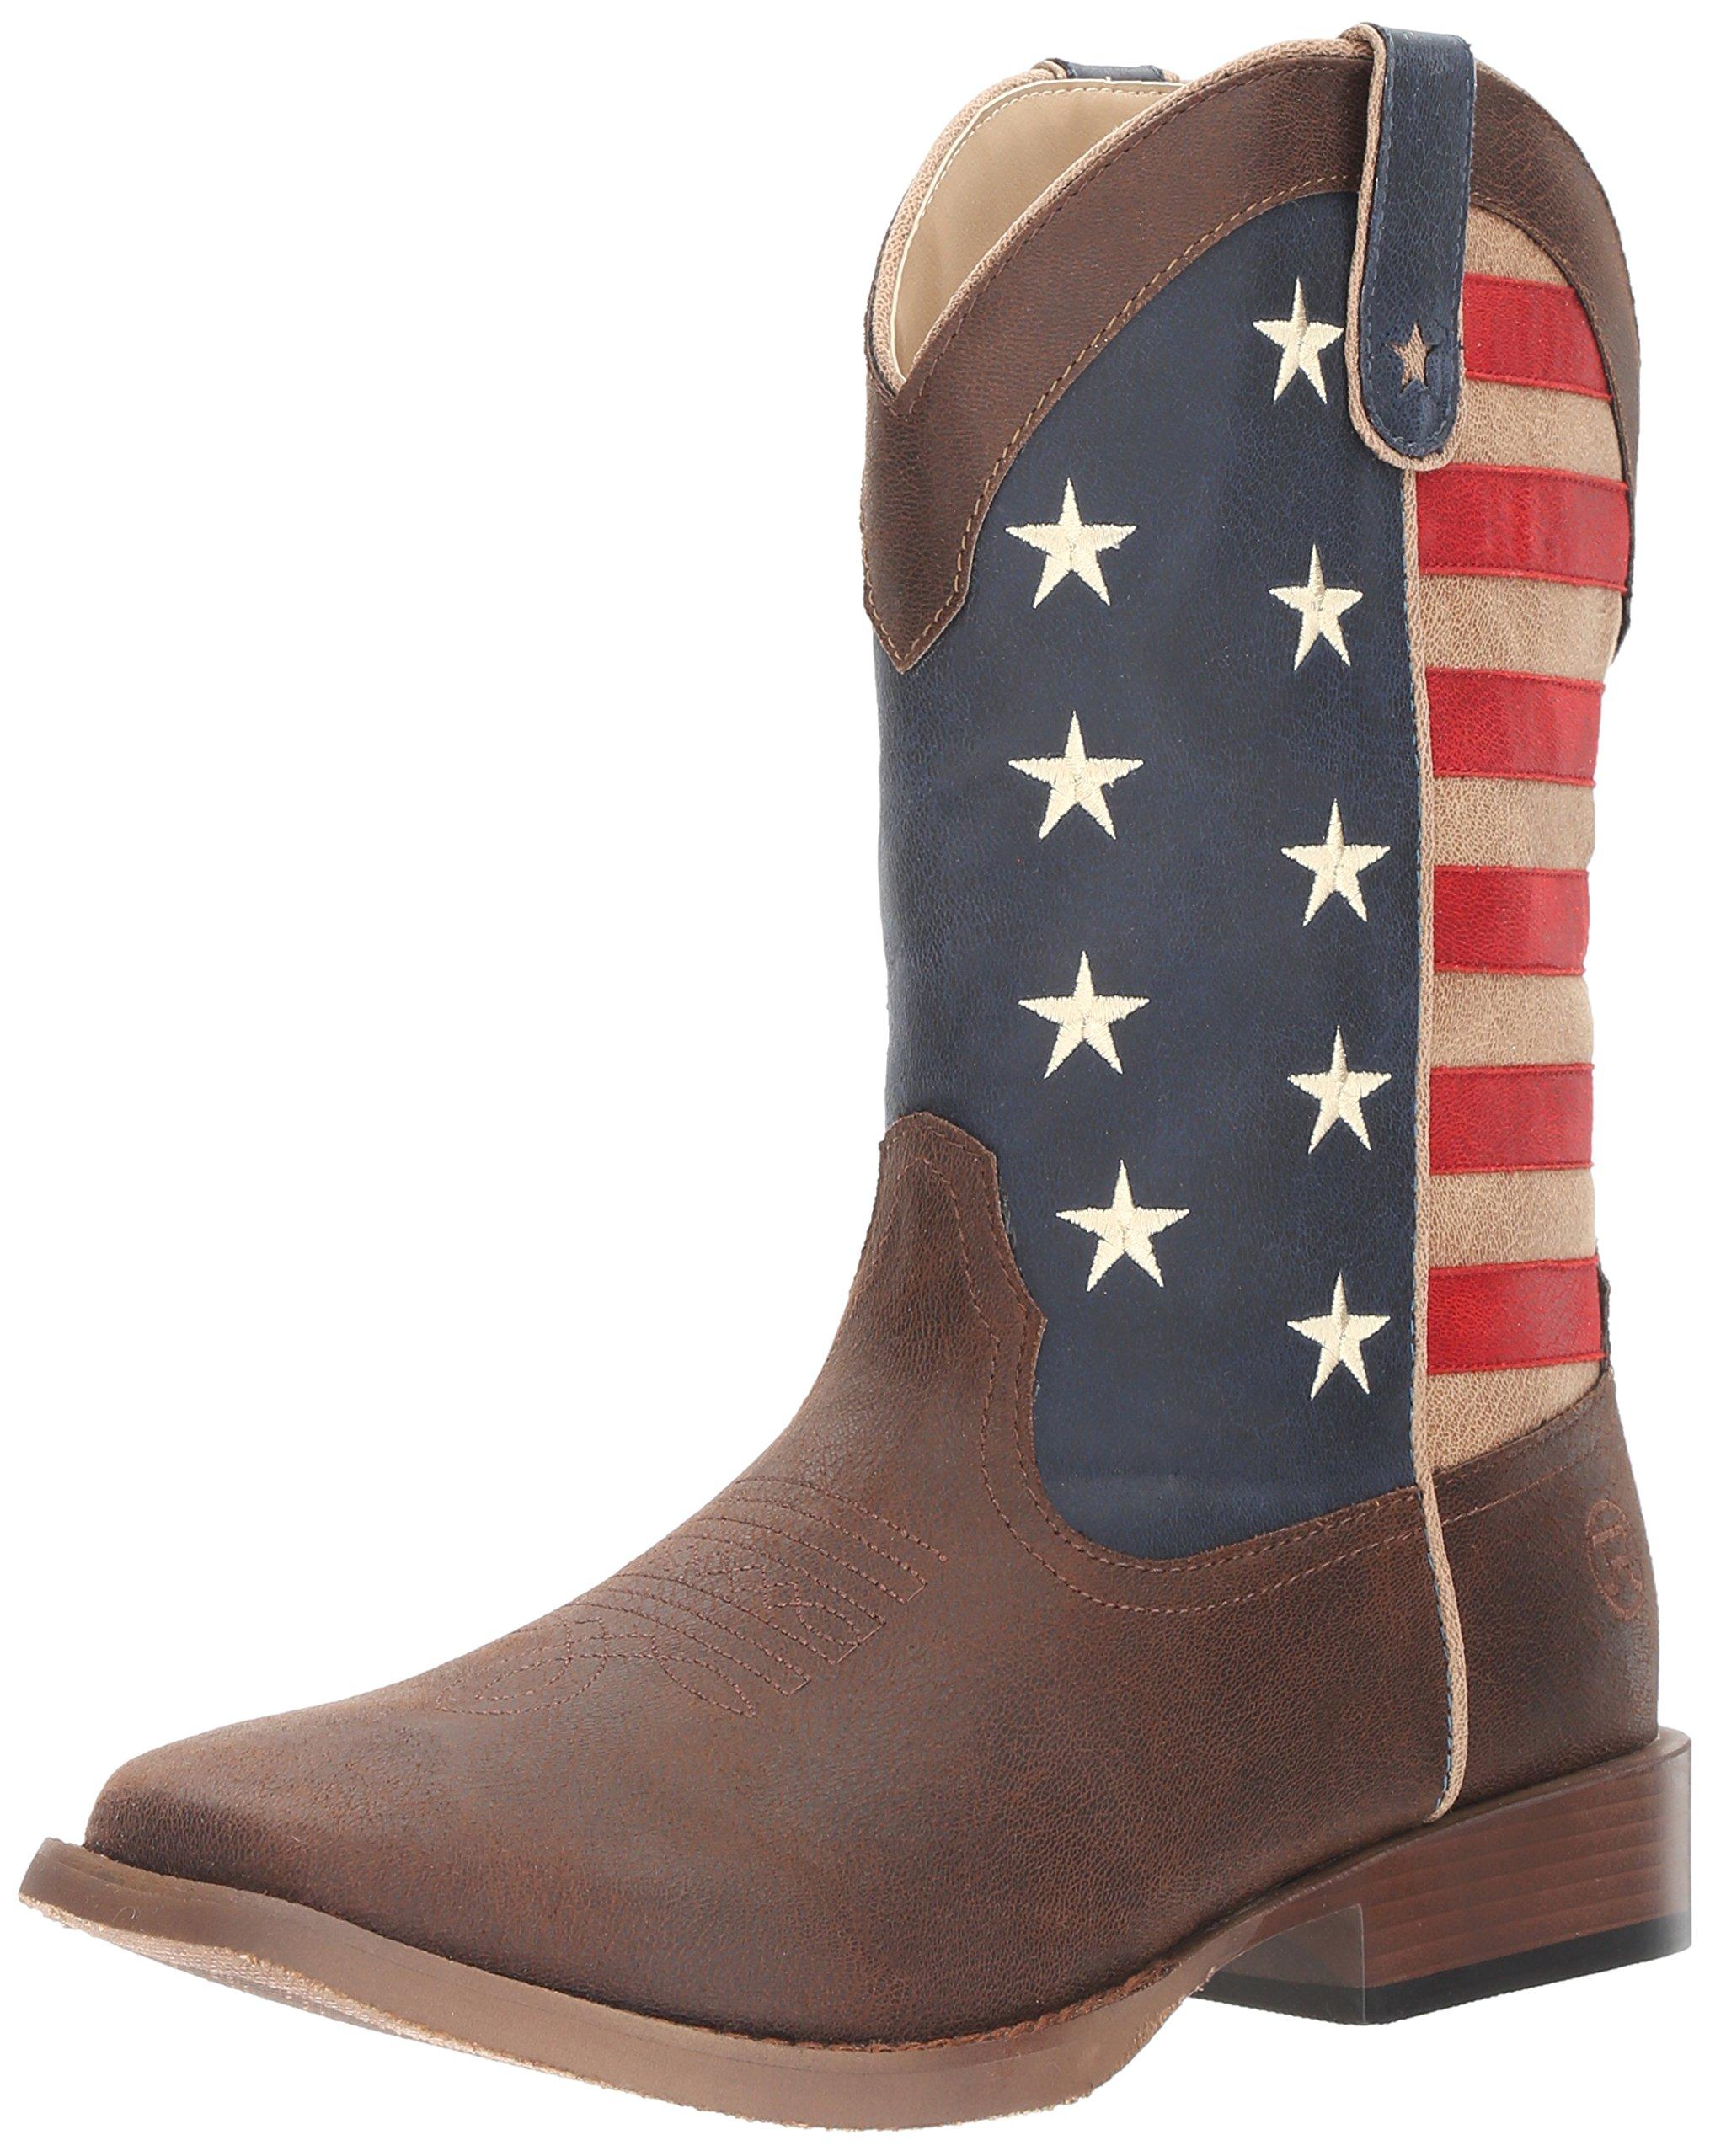 Roper Men's American Patriot Western Boot, Brown, 11 D US